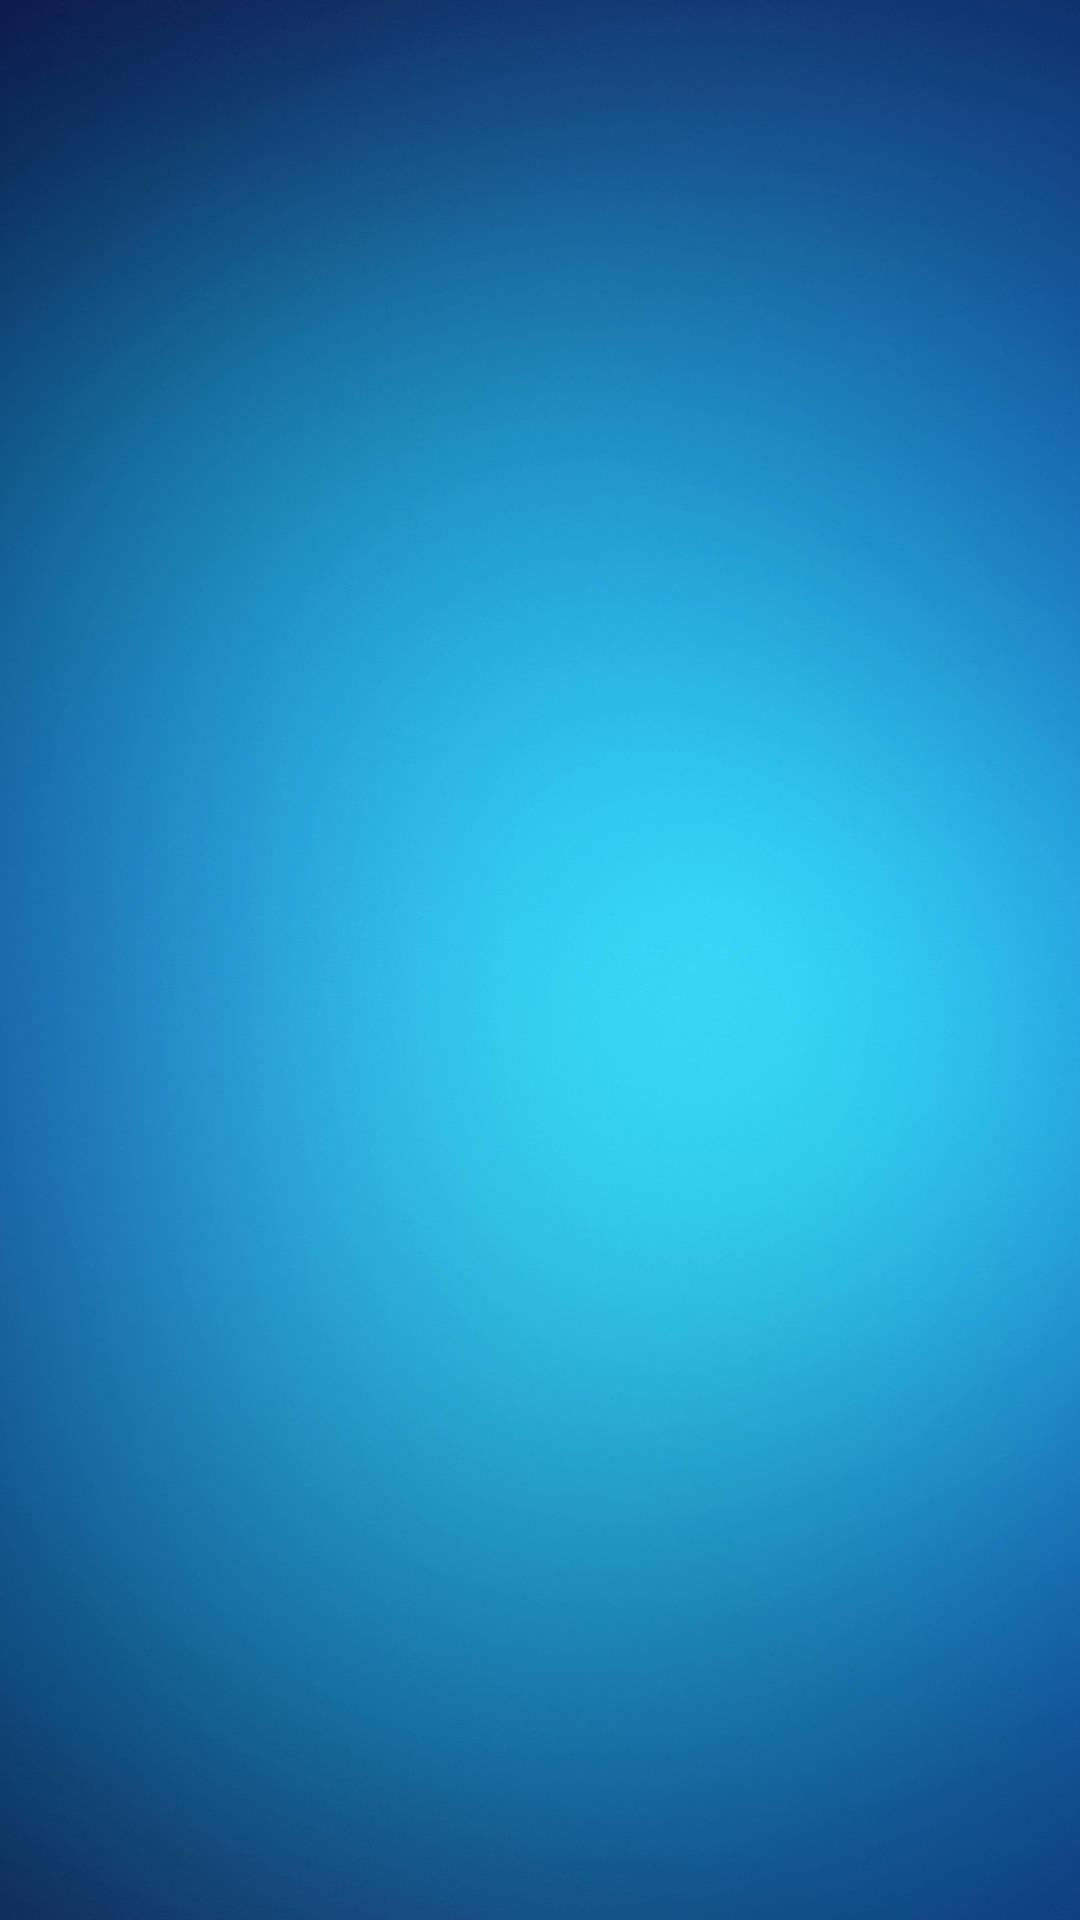 Blue Galaxy s4 Wallpaper 5127